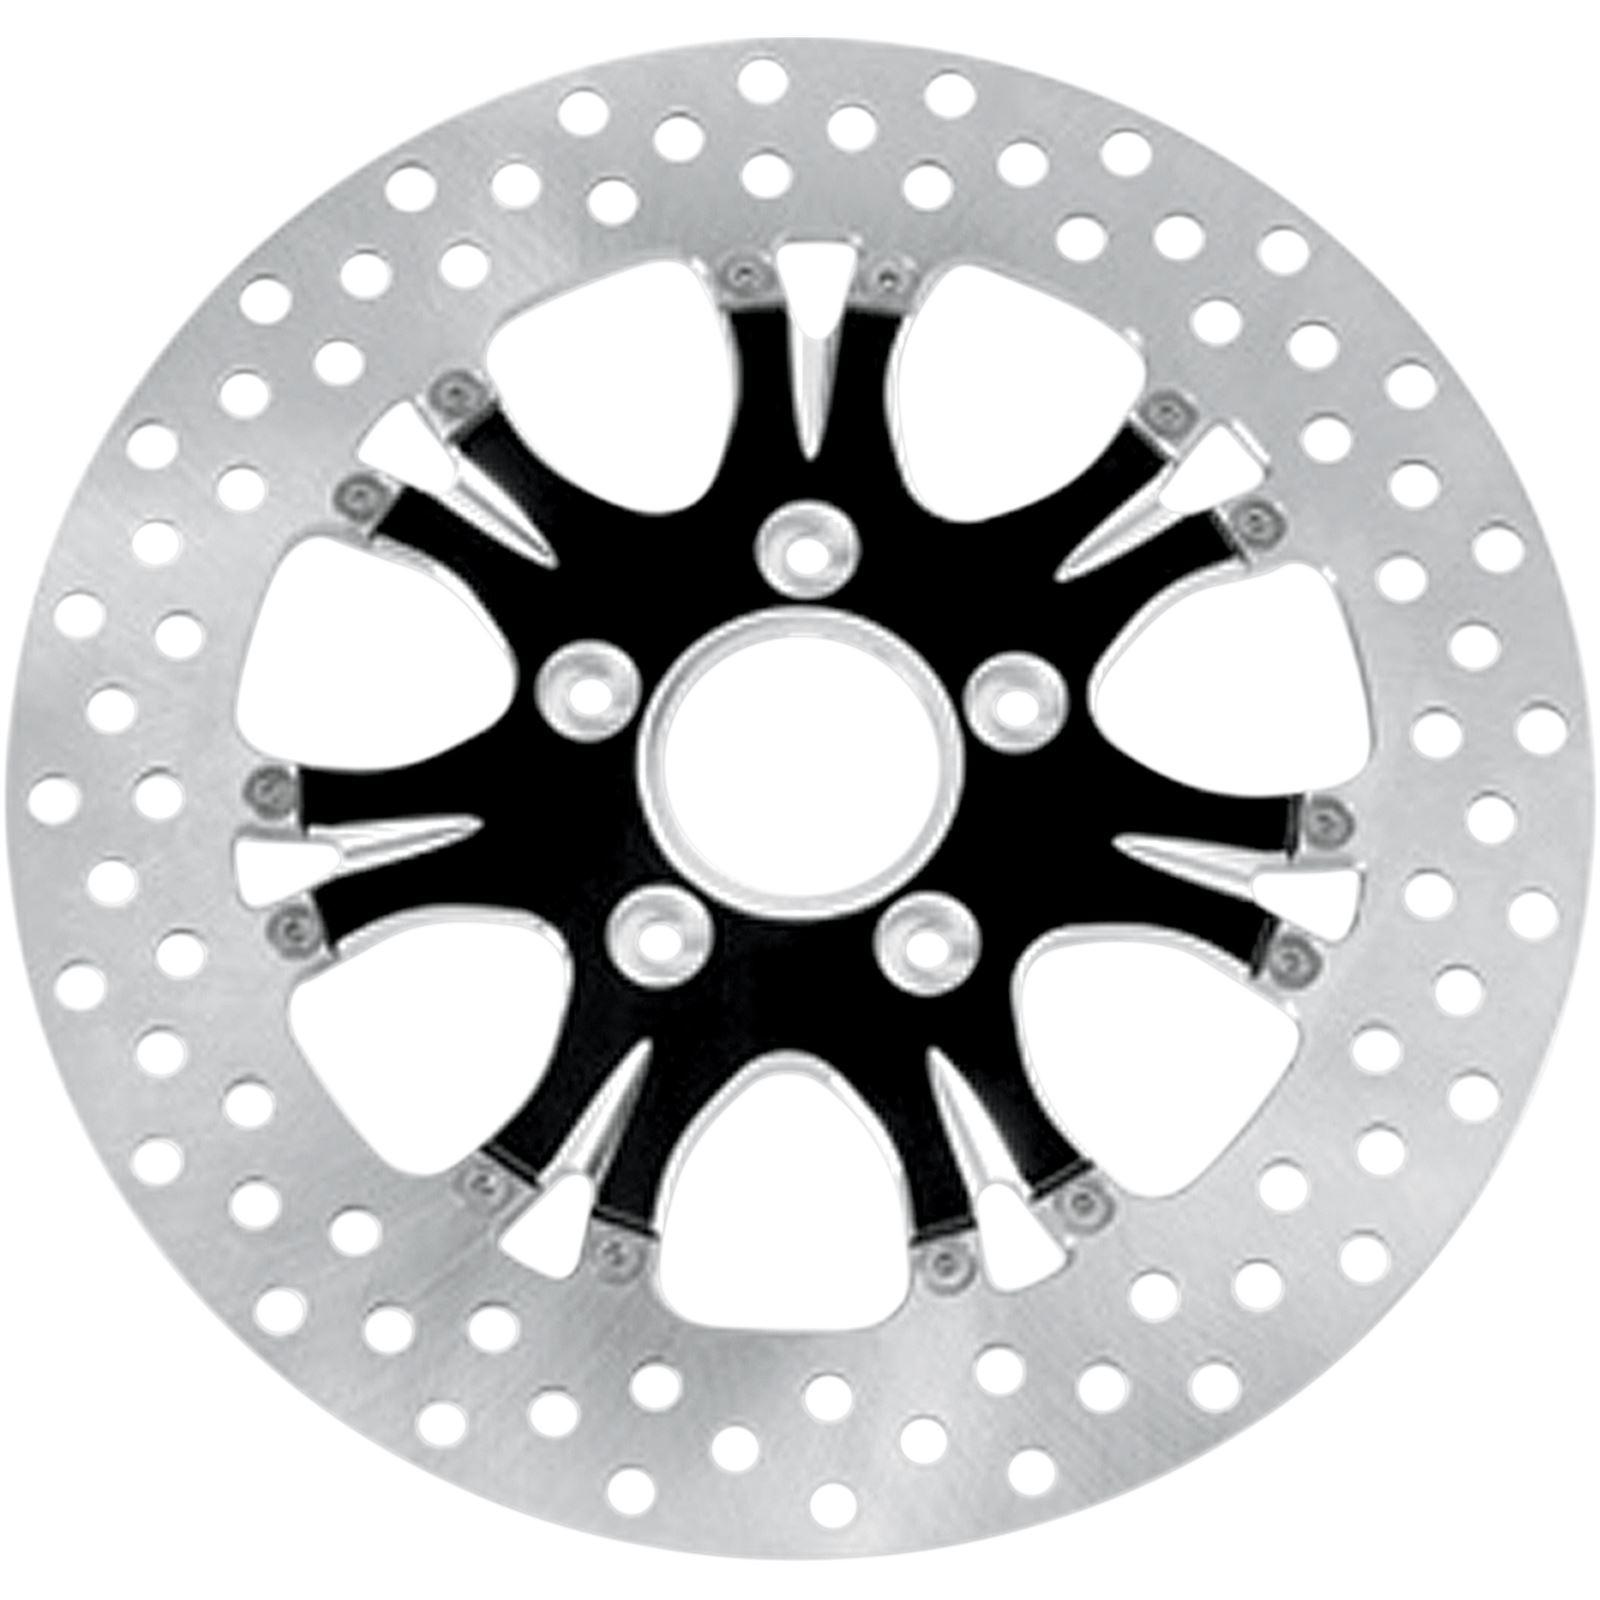 "Performance Machine Brake Rotor - 11.5"" - Paramount - Platinum Cut"